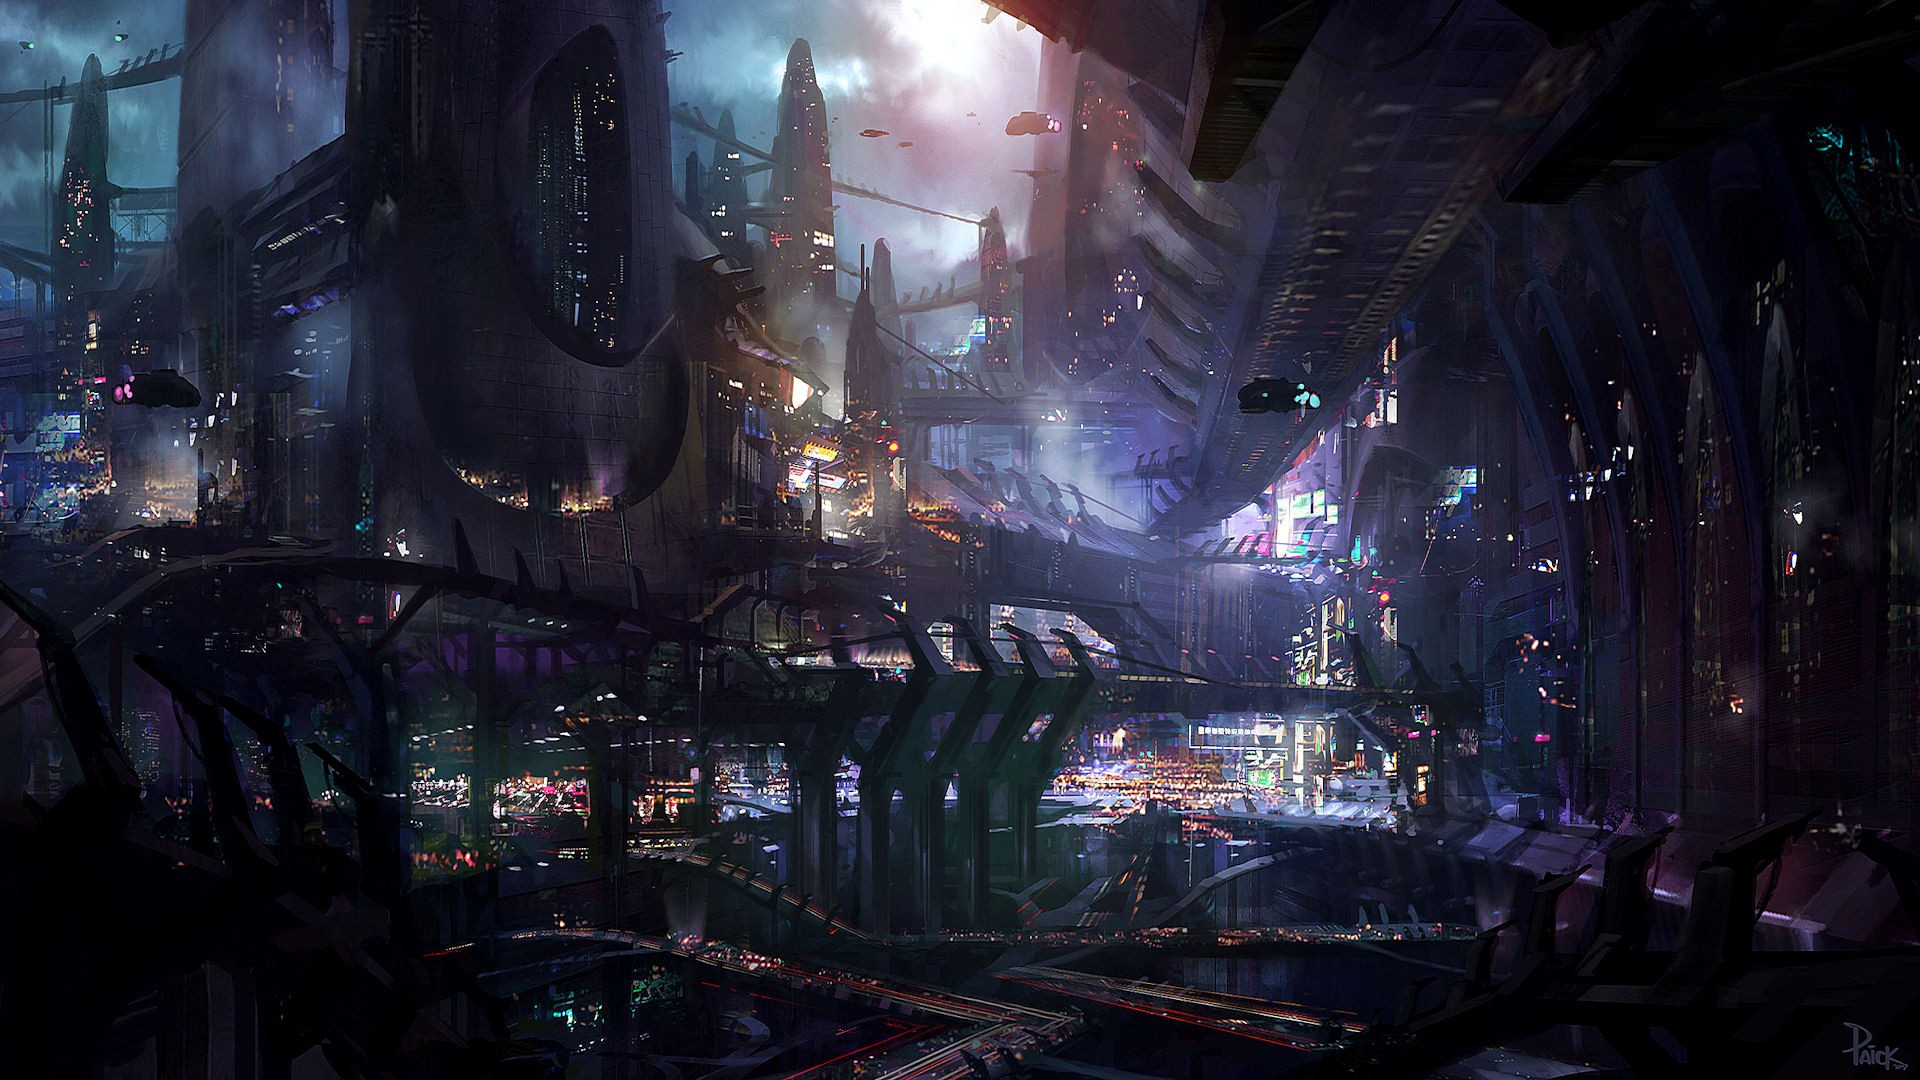 Persona 5 Girls Wallpaper Fantasy Art Science Fiction Futuristic Artwork City